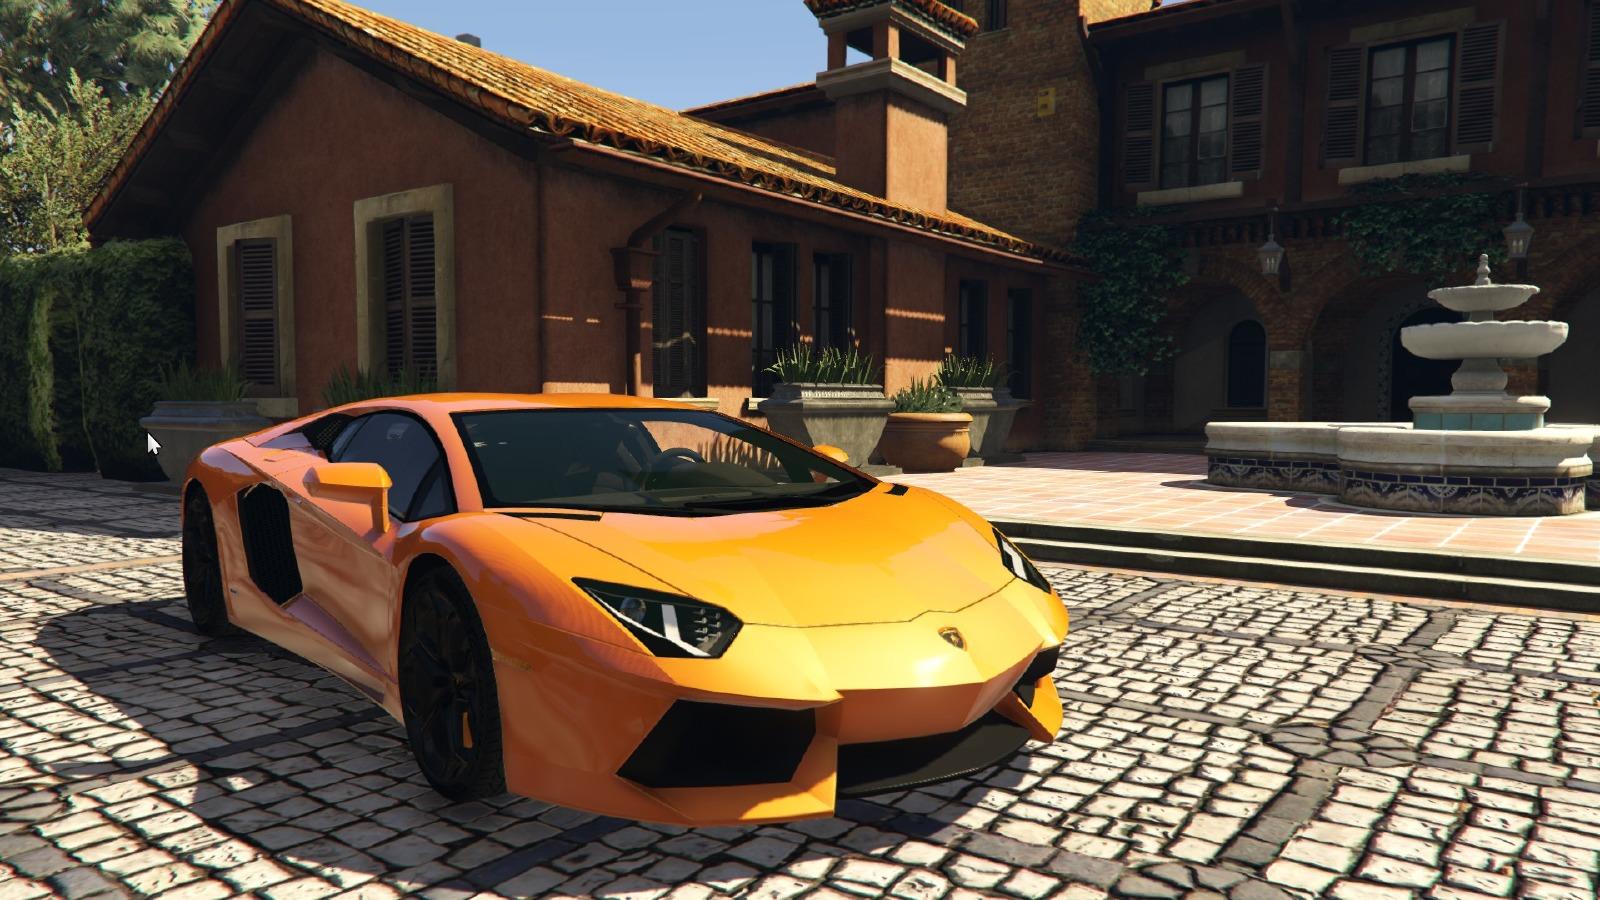 Lamborghini Aventador Lp700 4 2012 Vehicules Pour Gta V Sur Gta Modding